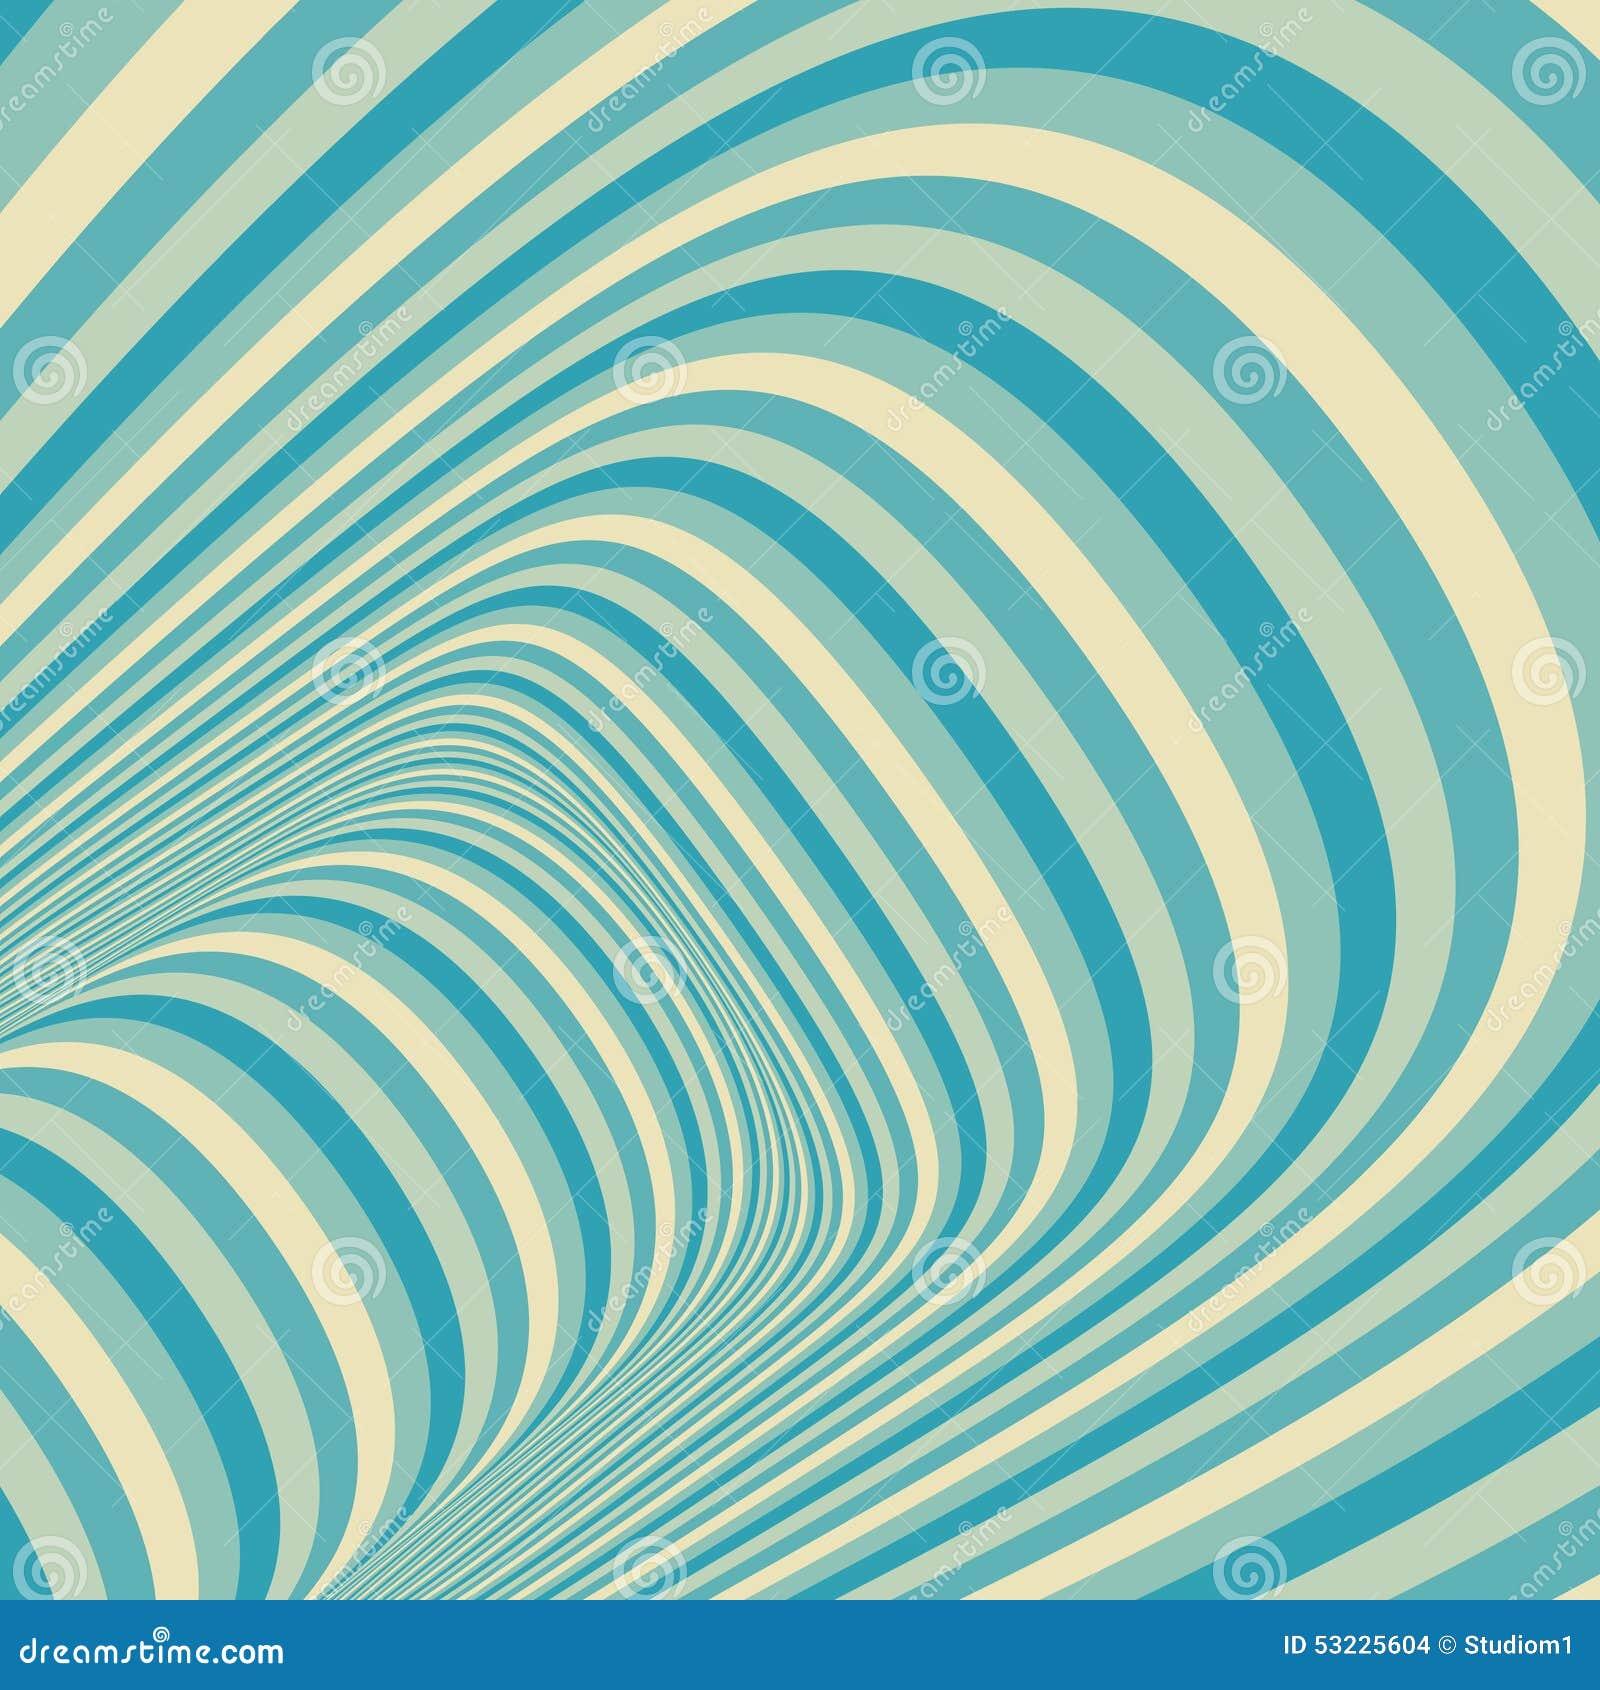 Fondo geométrico abstracto 3d